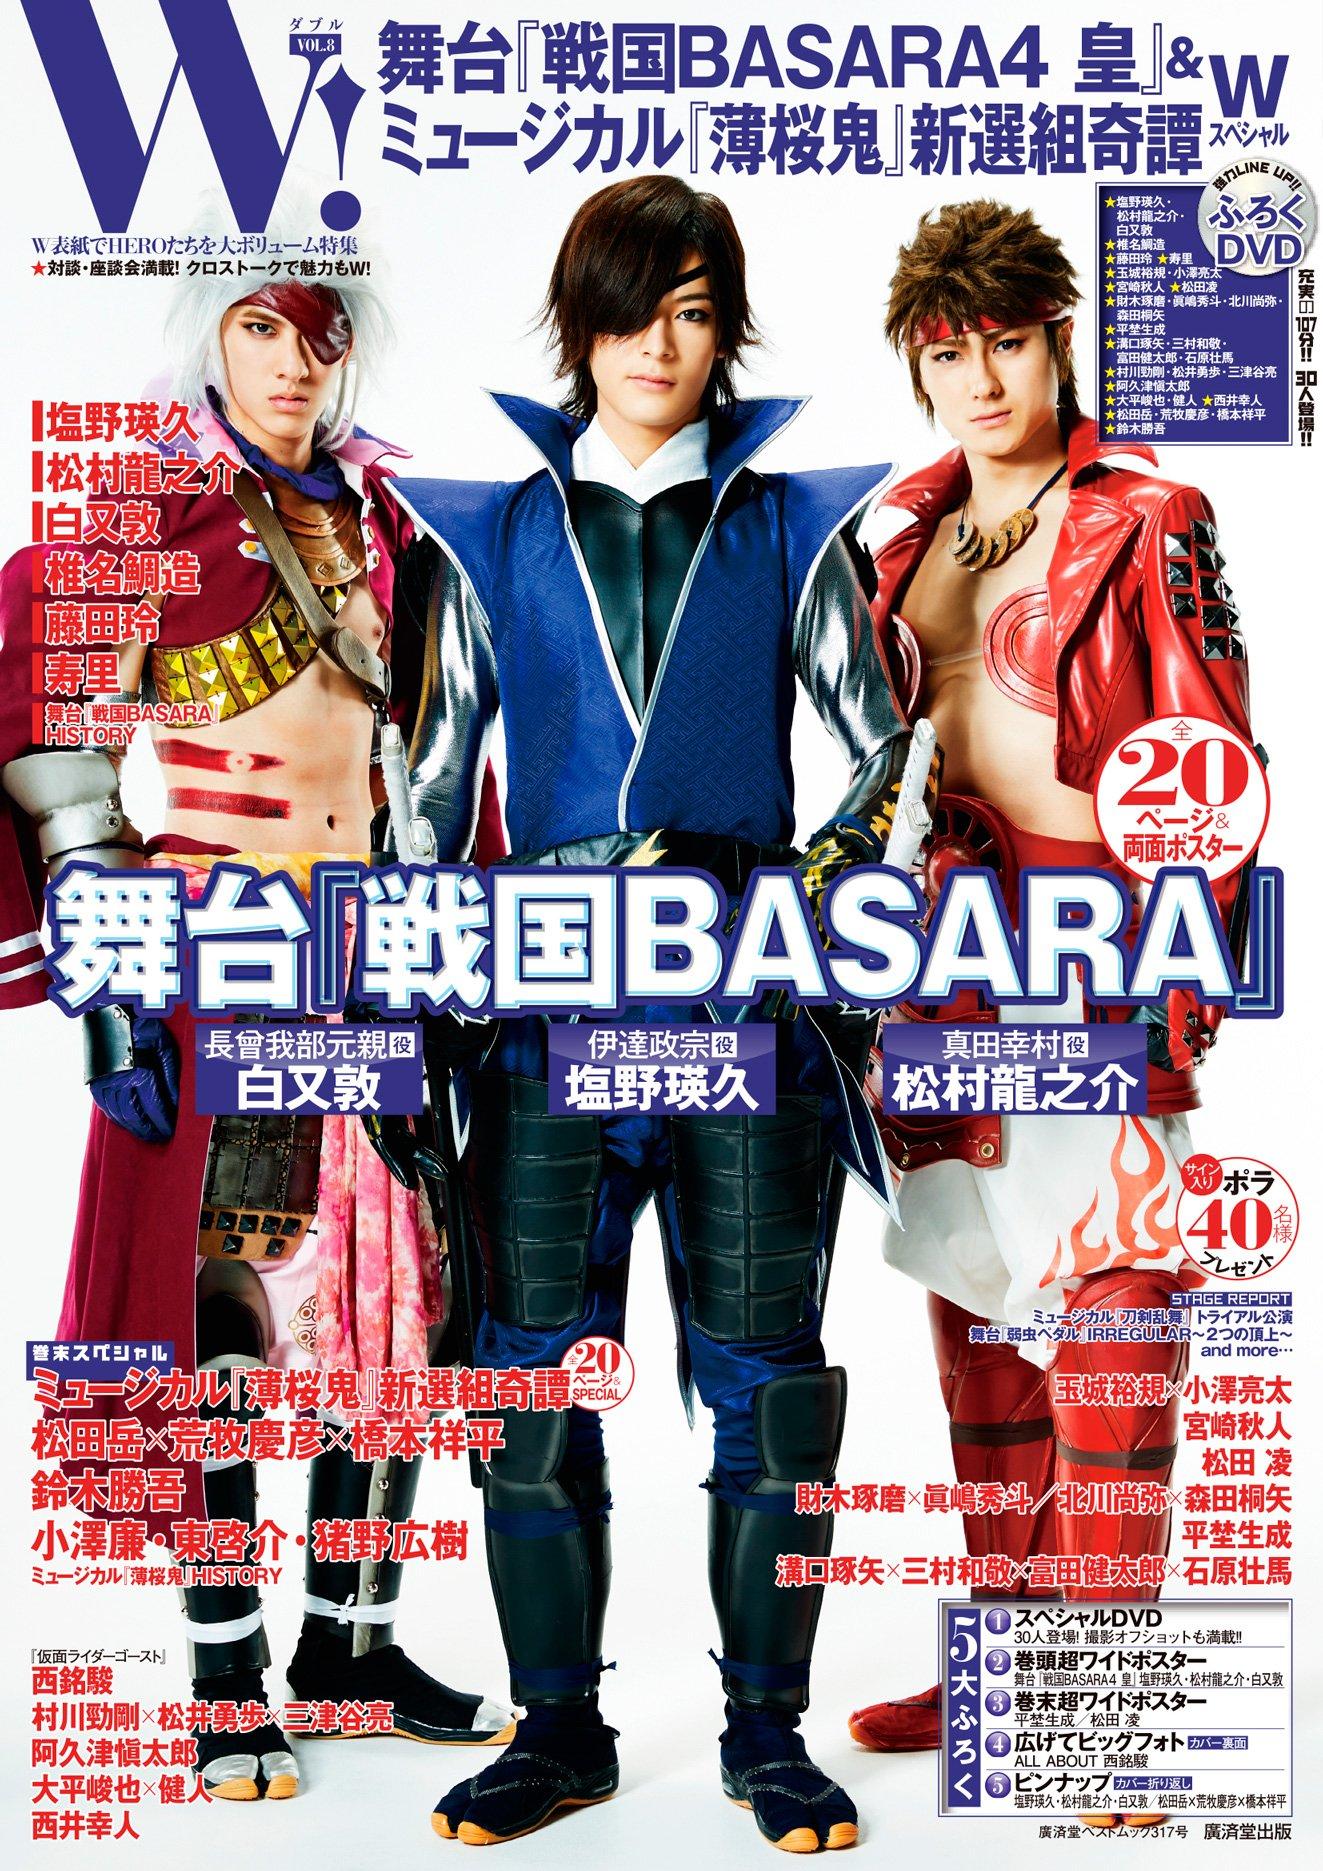 "W VOL.8 stage ""Sengoku BASARA4 Crown' & musical""hakuouki Shinsengumi Brigade odd Tan W special kosaido co., Ltd. best music 317 (in) pdf"